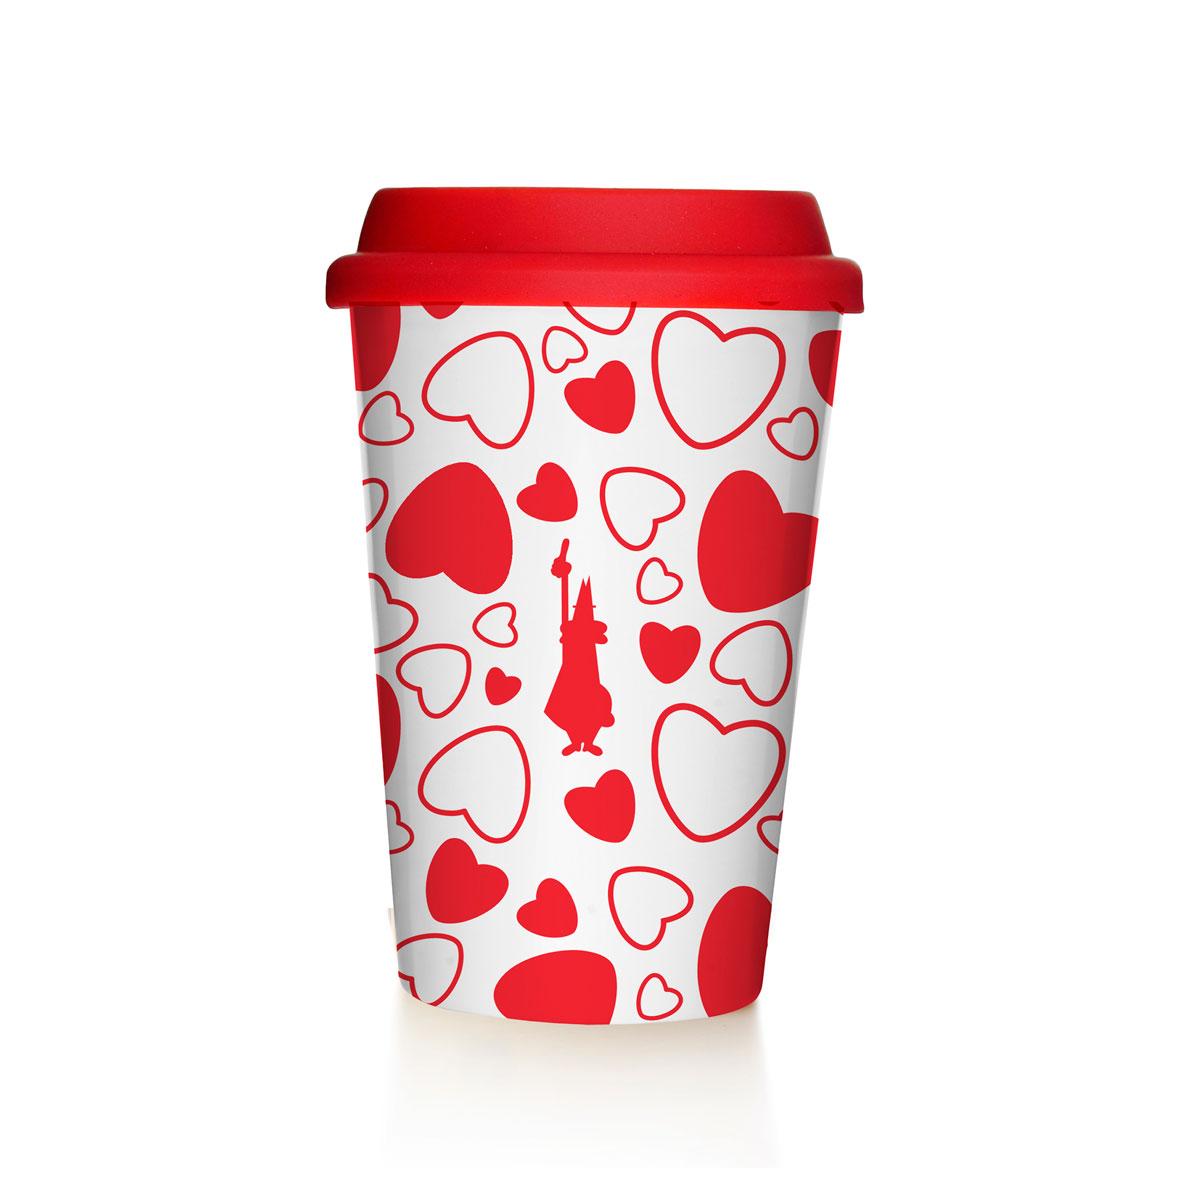 Vaso térmico para llevar Café Mug Take Away Cuore Bialetti Perú